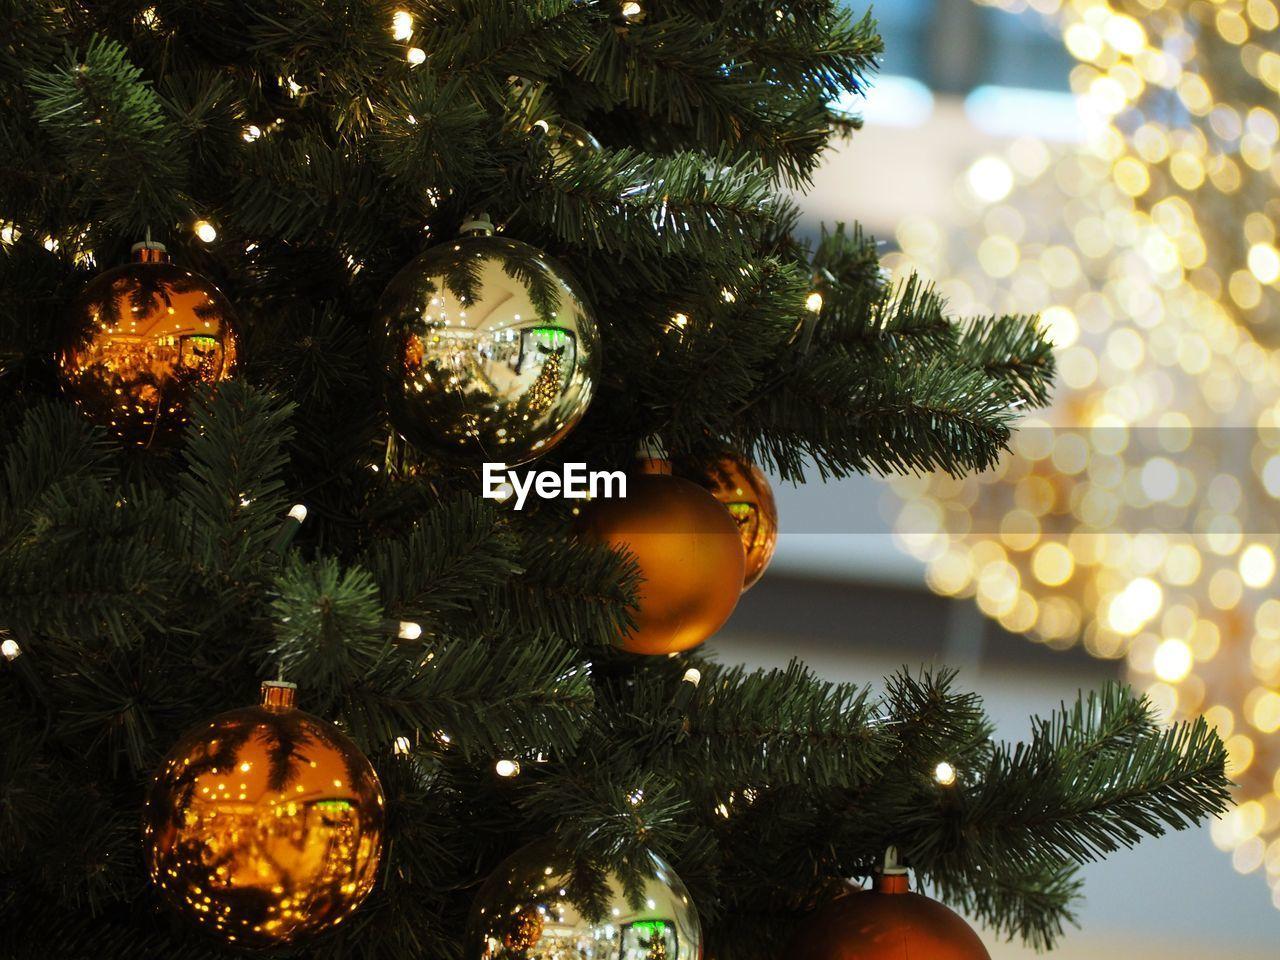 christmas, holiday, celebration, christmas tree, decoration, christmas decoration, tree, christmas ornament, illuminated, christmas lights, indoors, holiday - event, celebration event, close-up, no people, hanging, trip, vacations, light